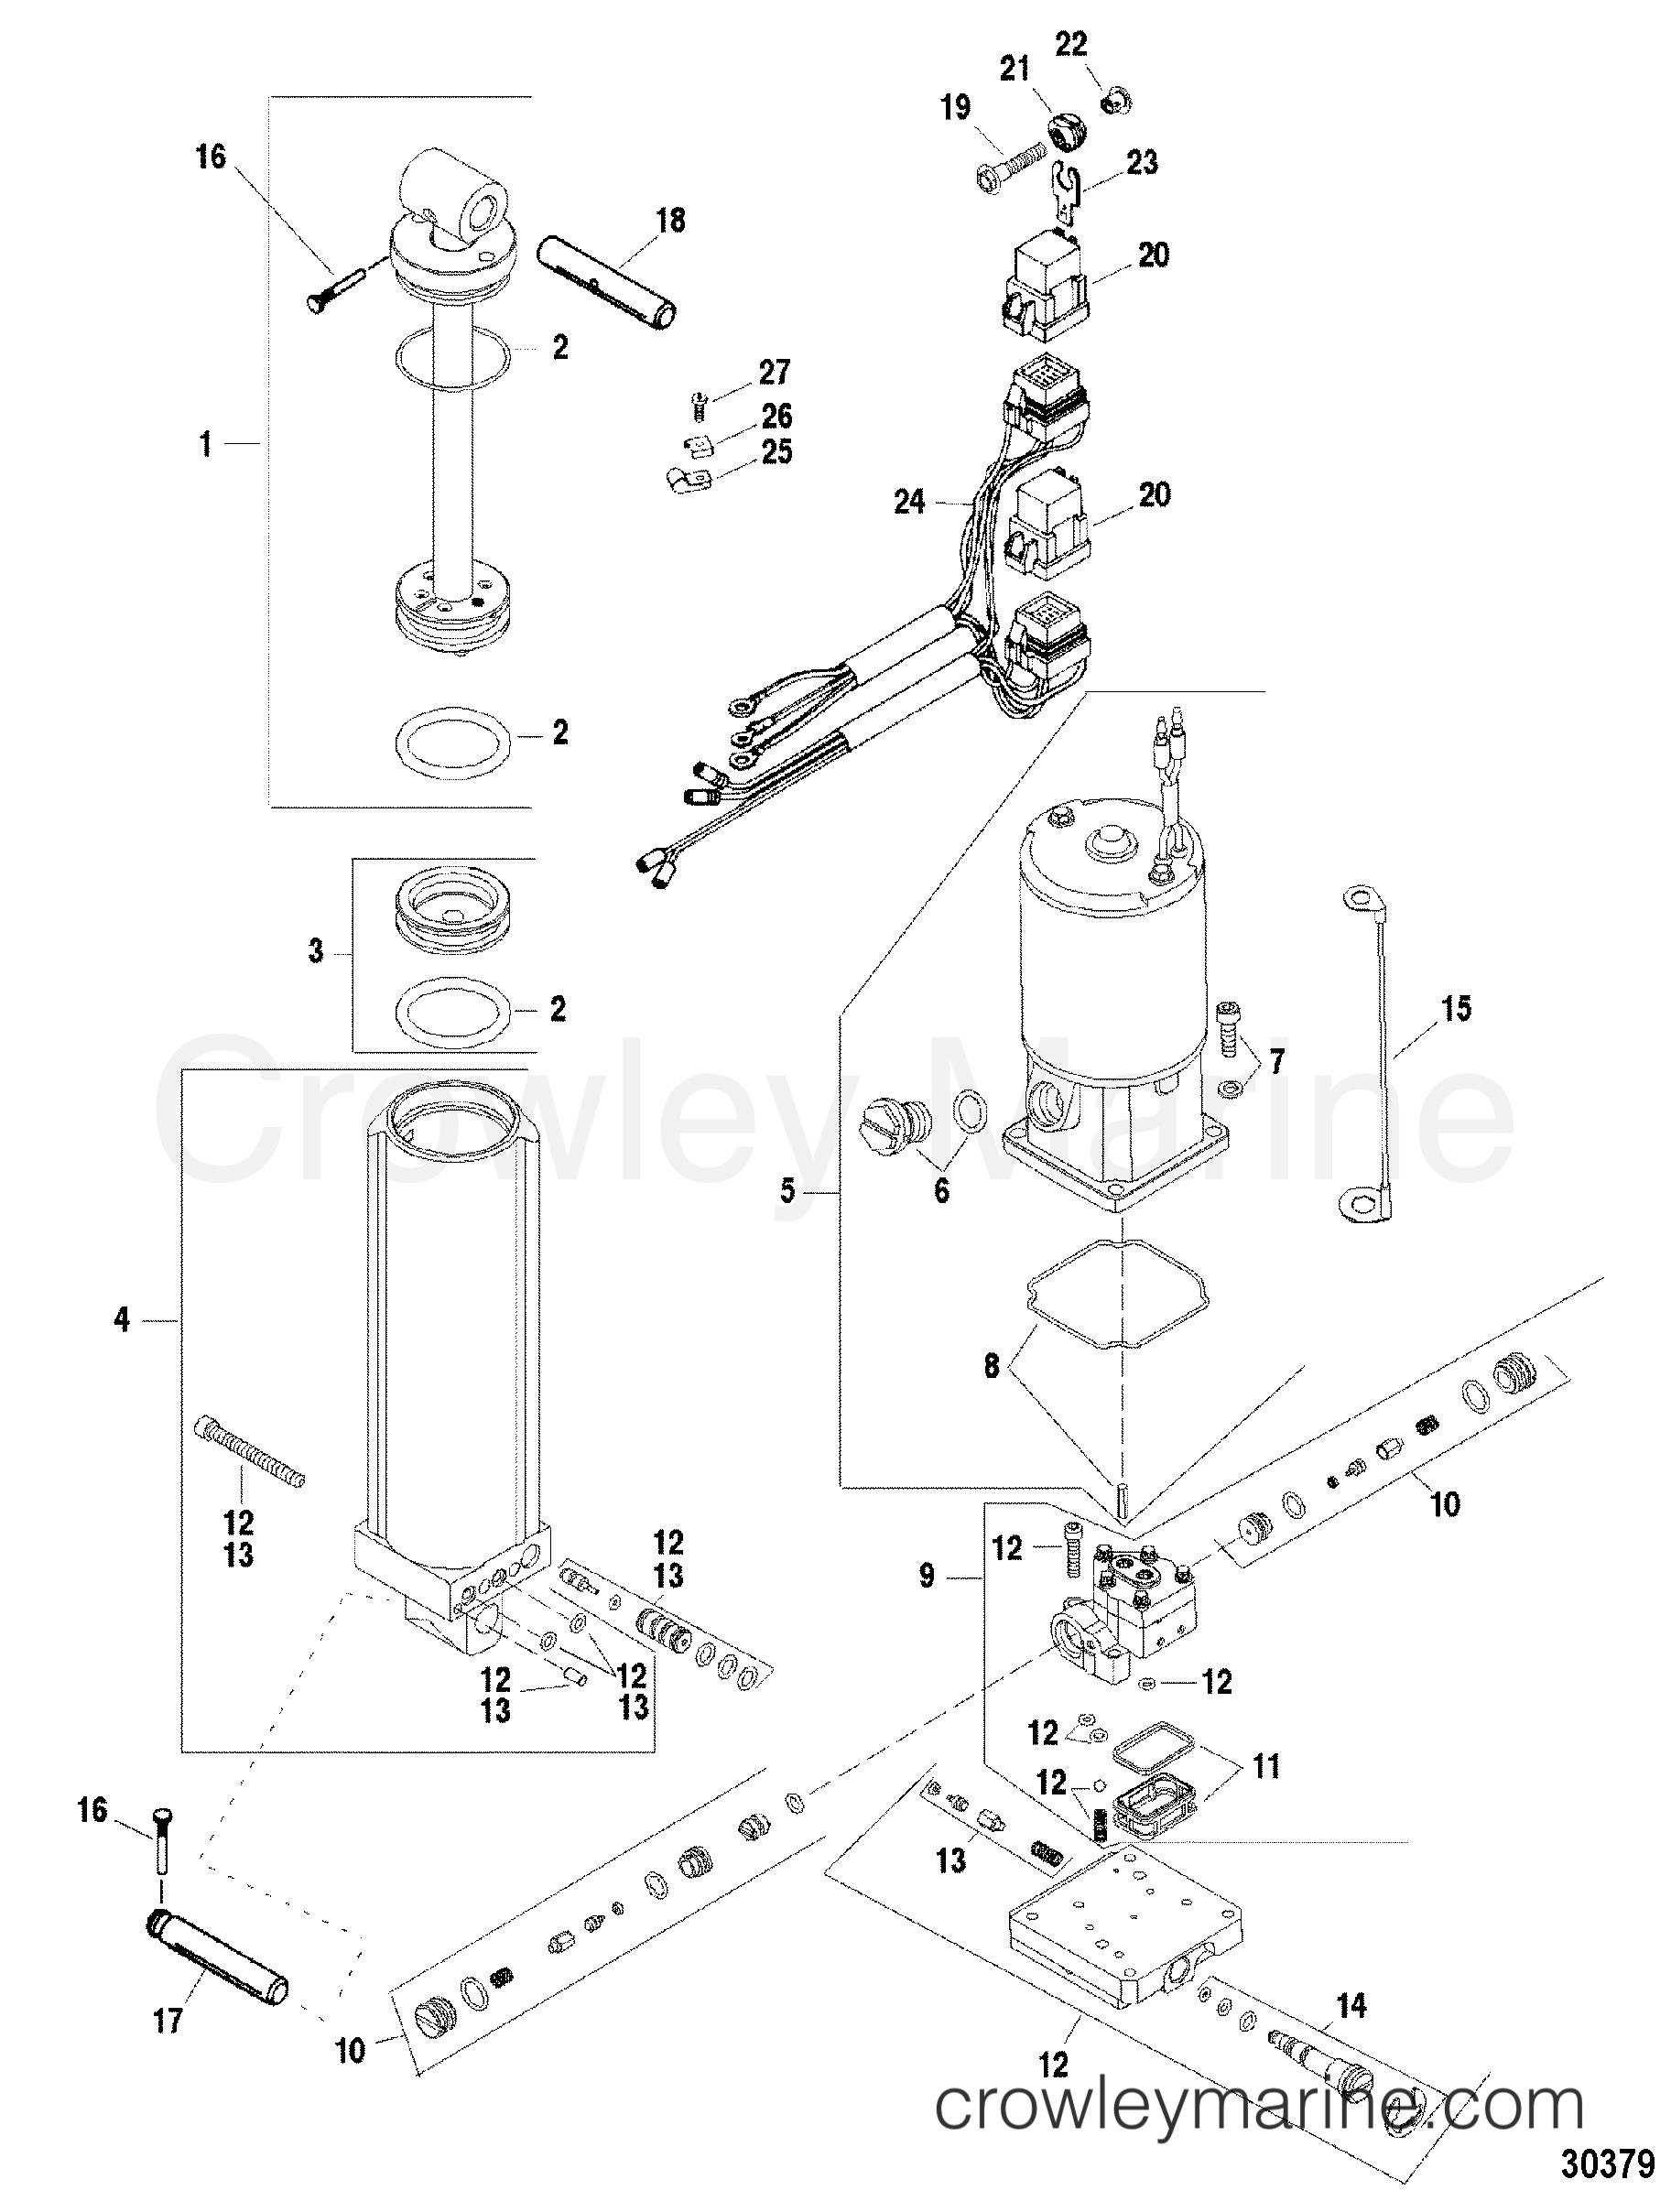 Pump Motor Assembly A3